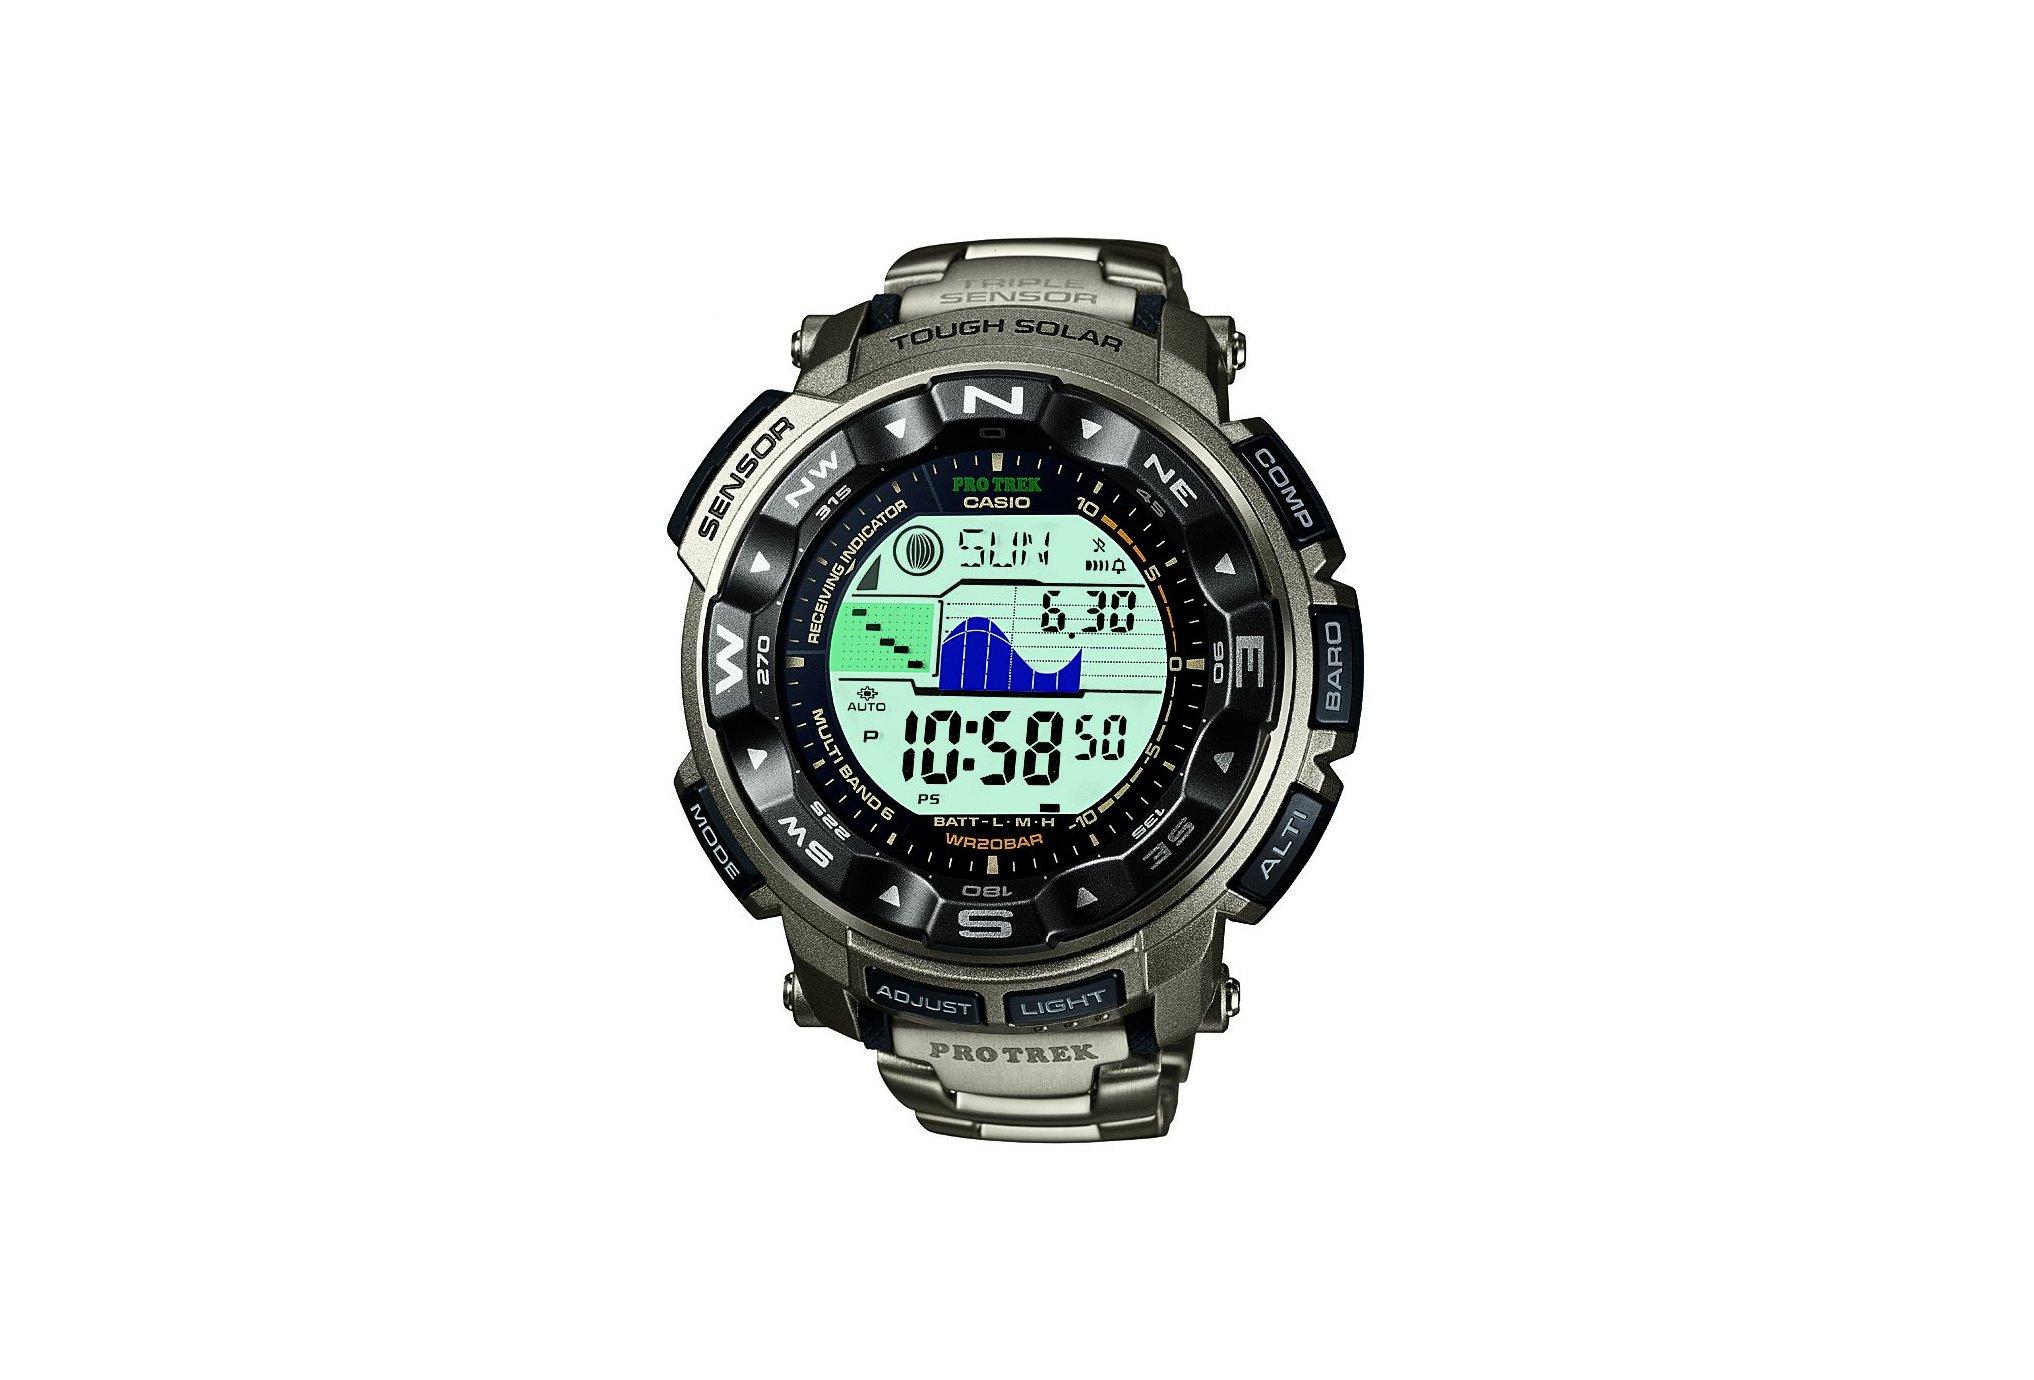 Casio Pro trek prw-2500t montres de sport